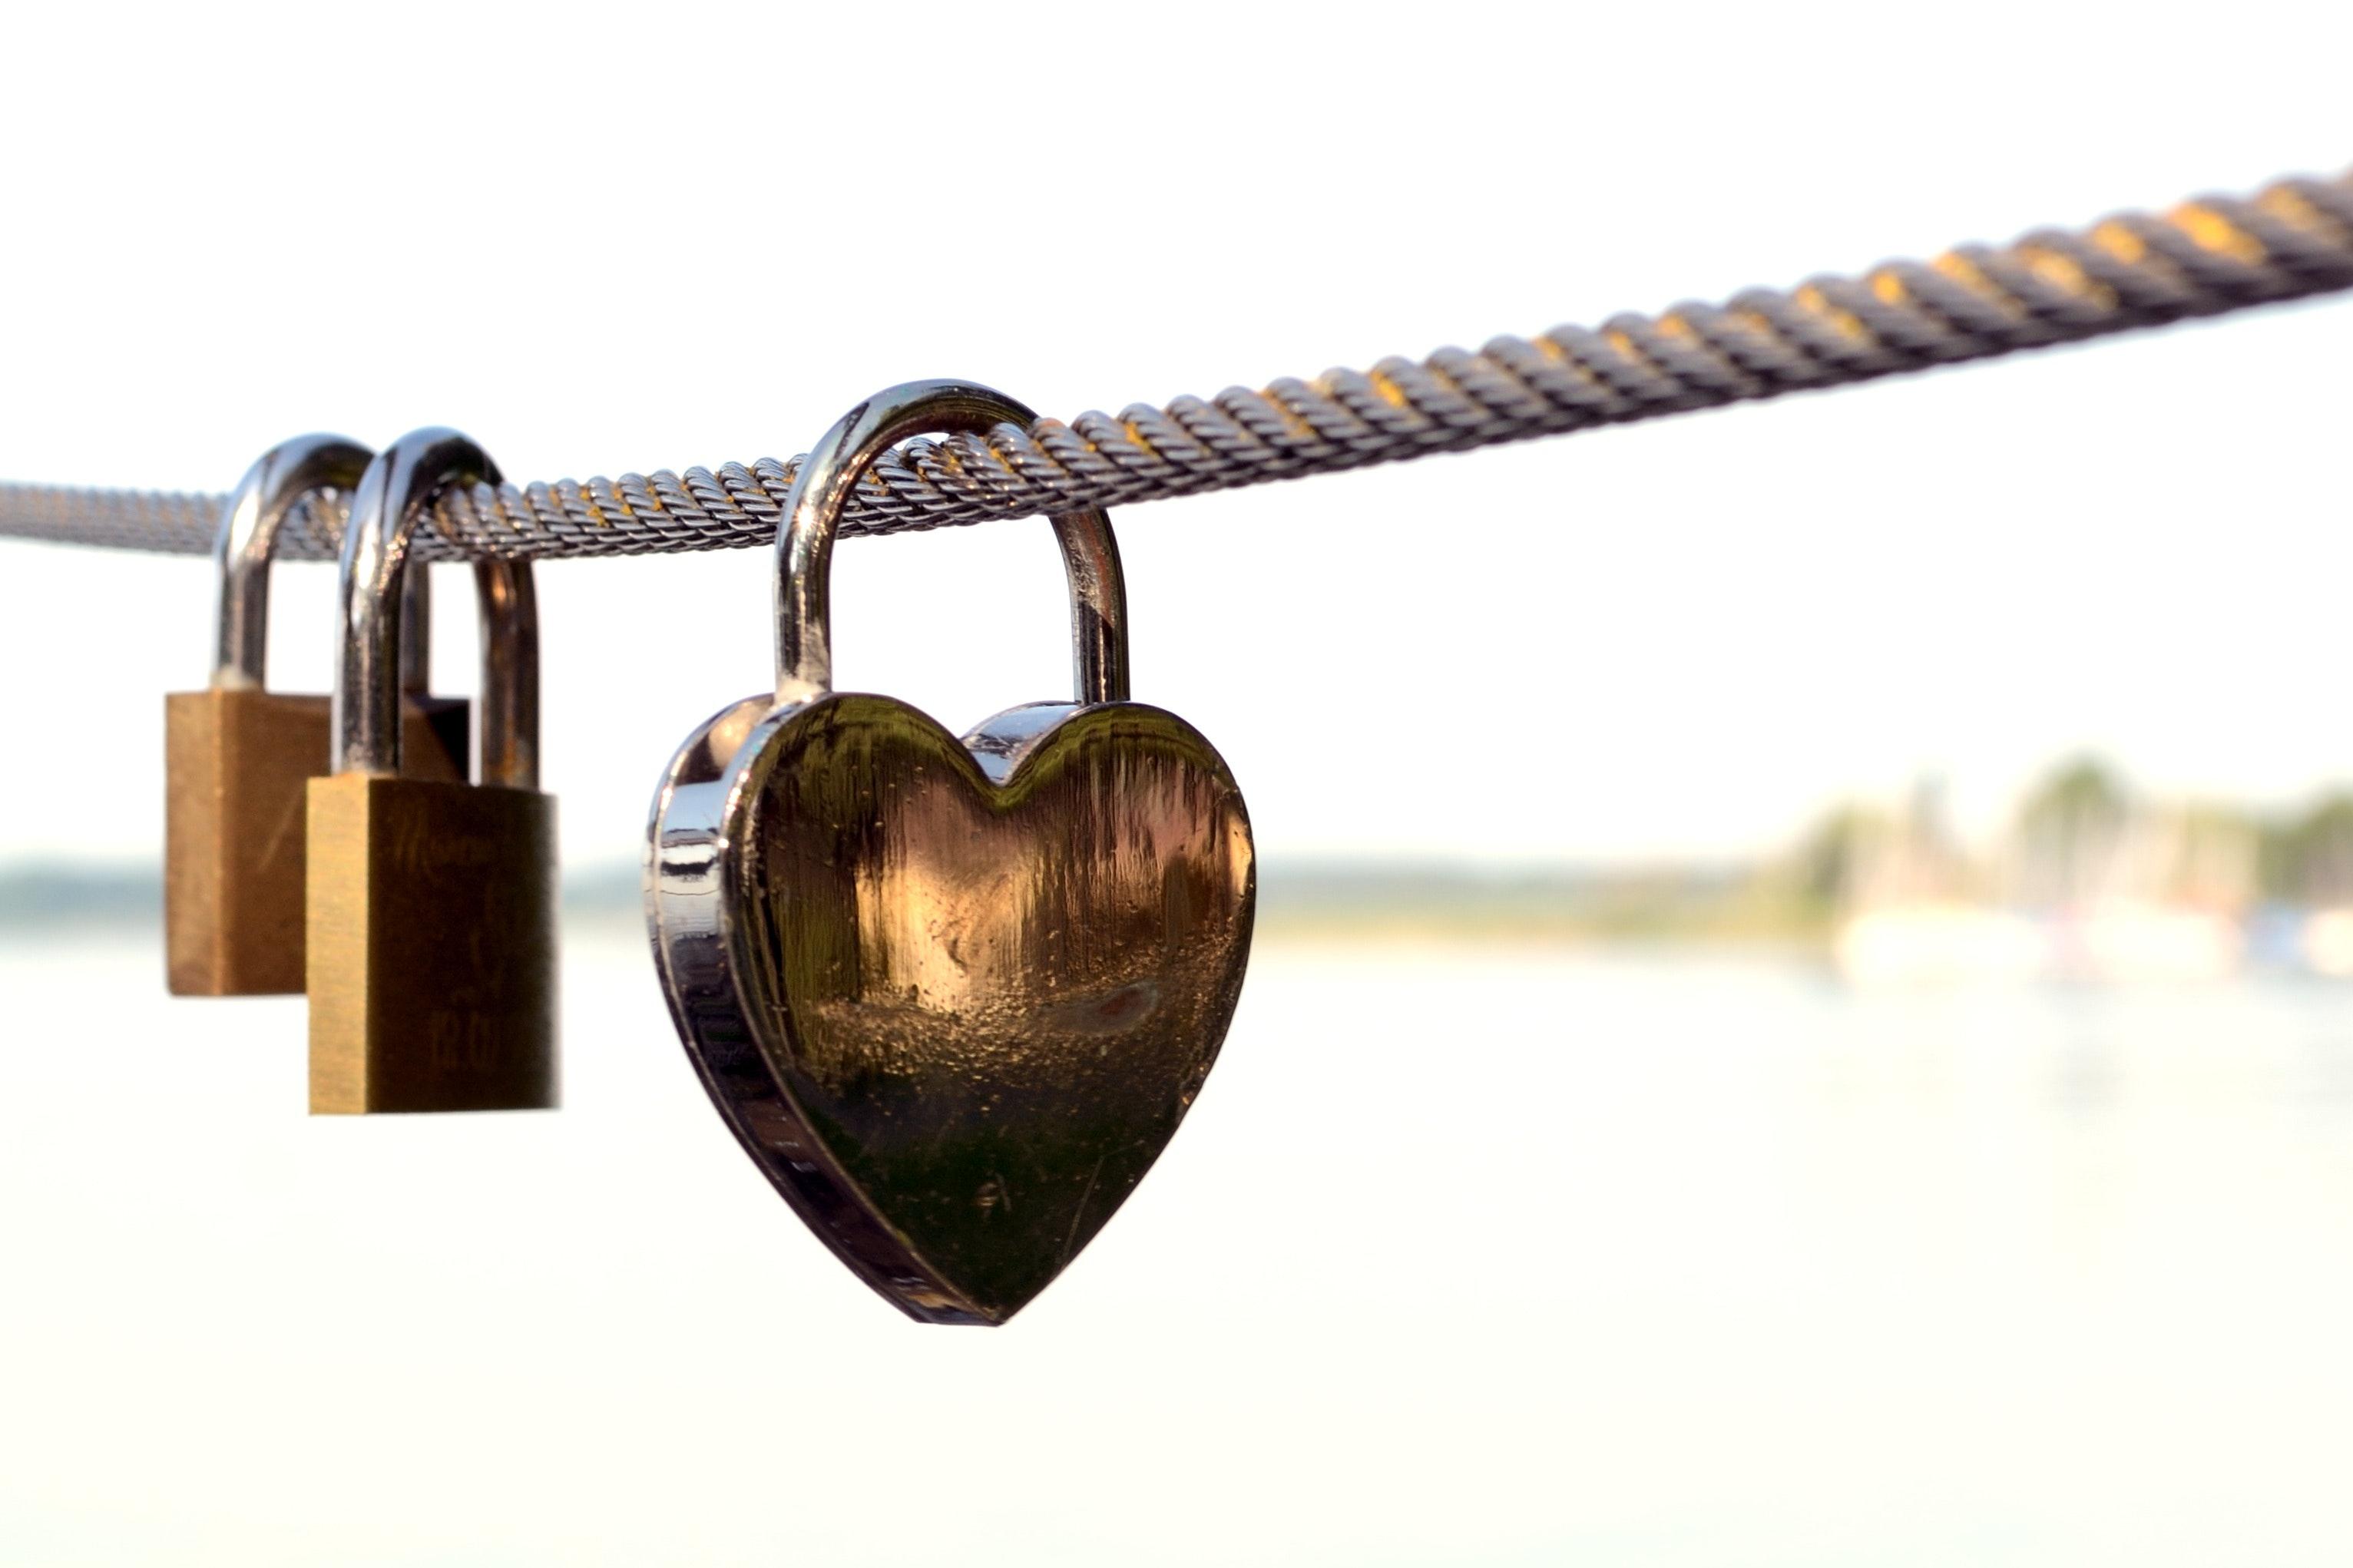 RADIUS MFA symbolized with a heart-shaped lock